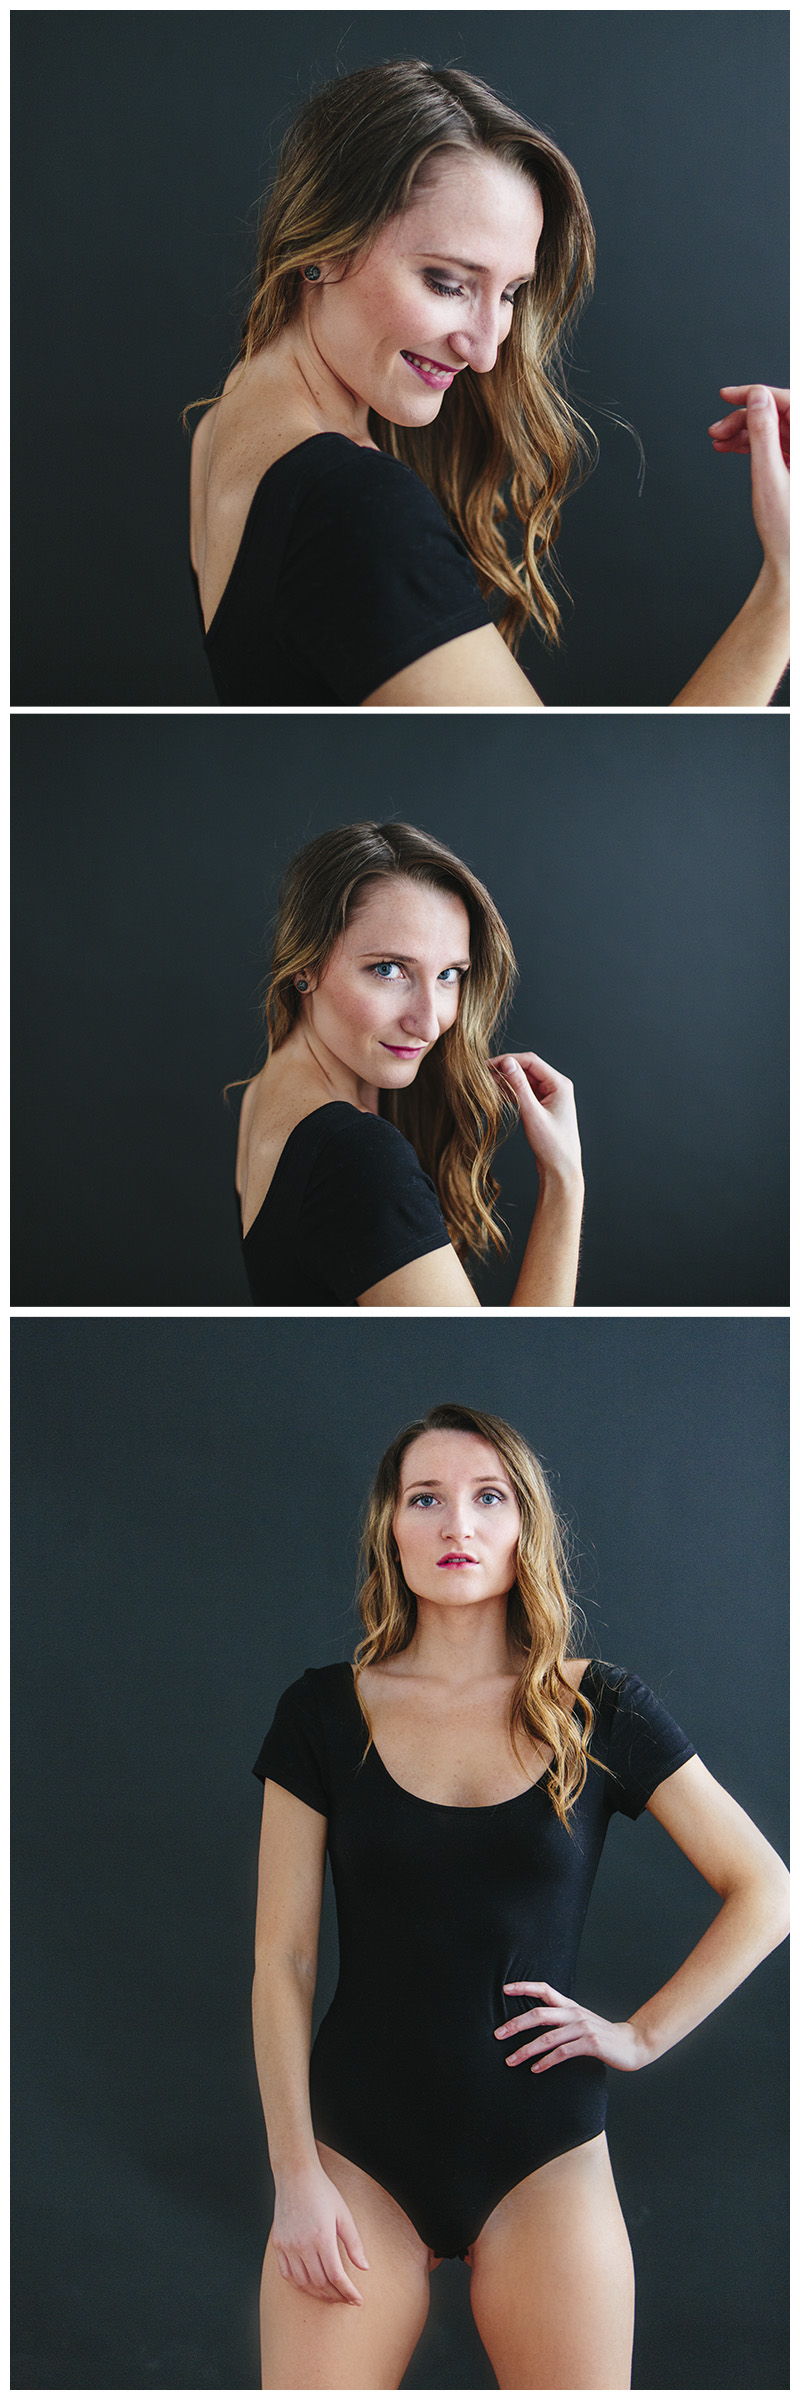 Male and Female model photo shoot of Maurice Photo and Tara Nix